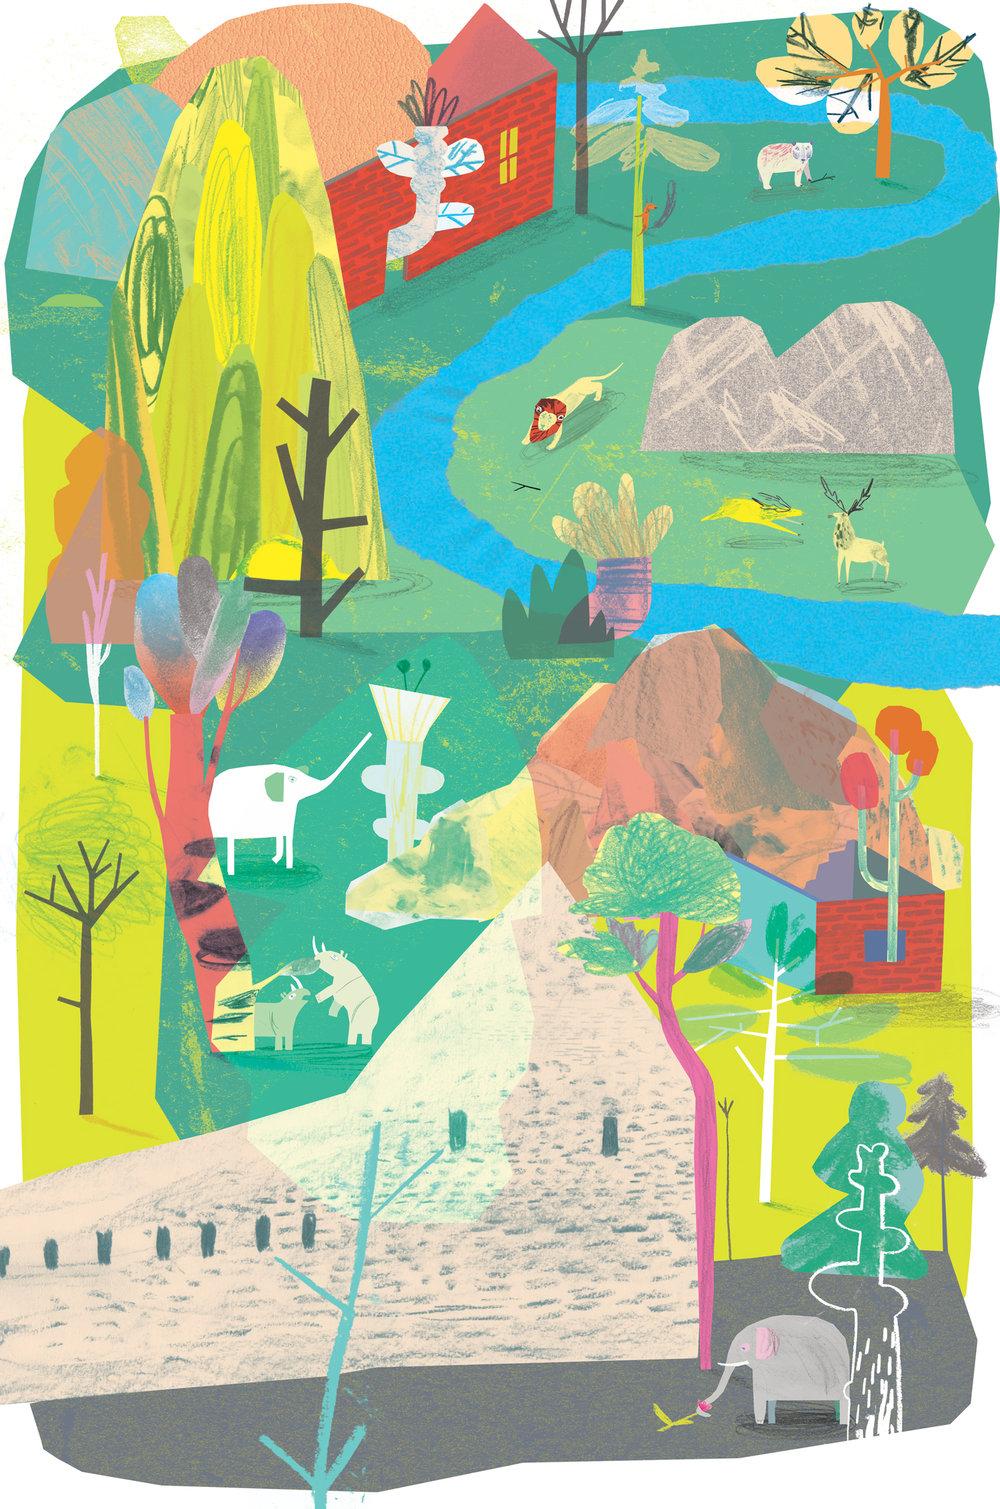 Rewilding by Natasha Durley